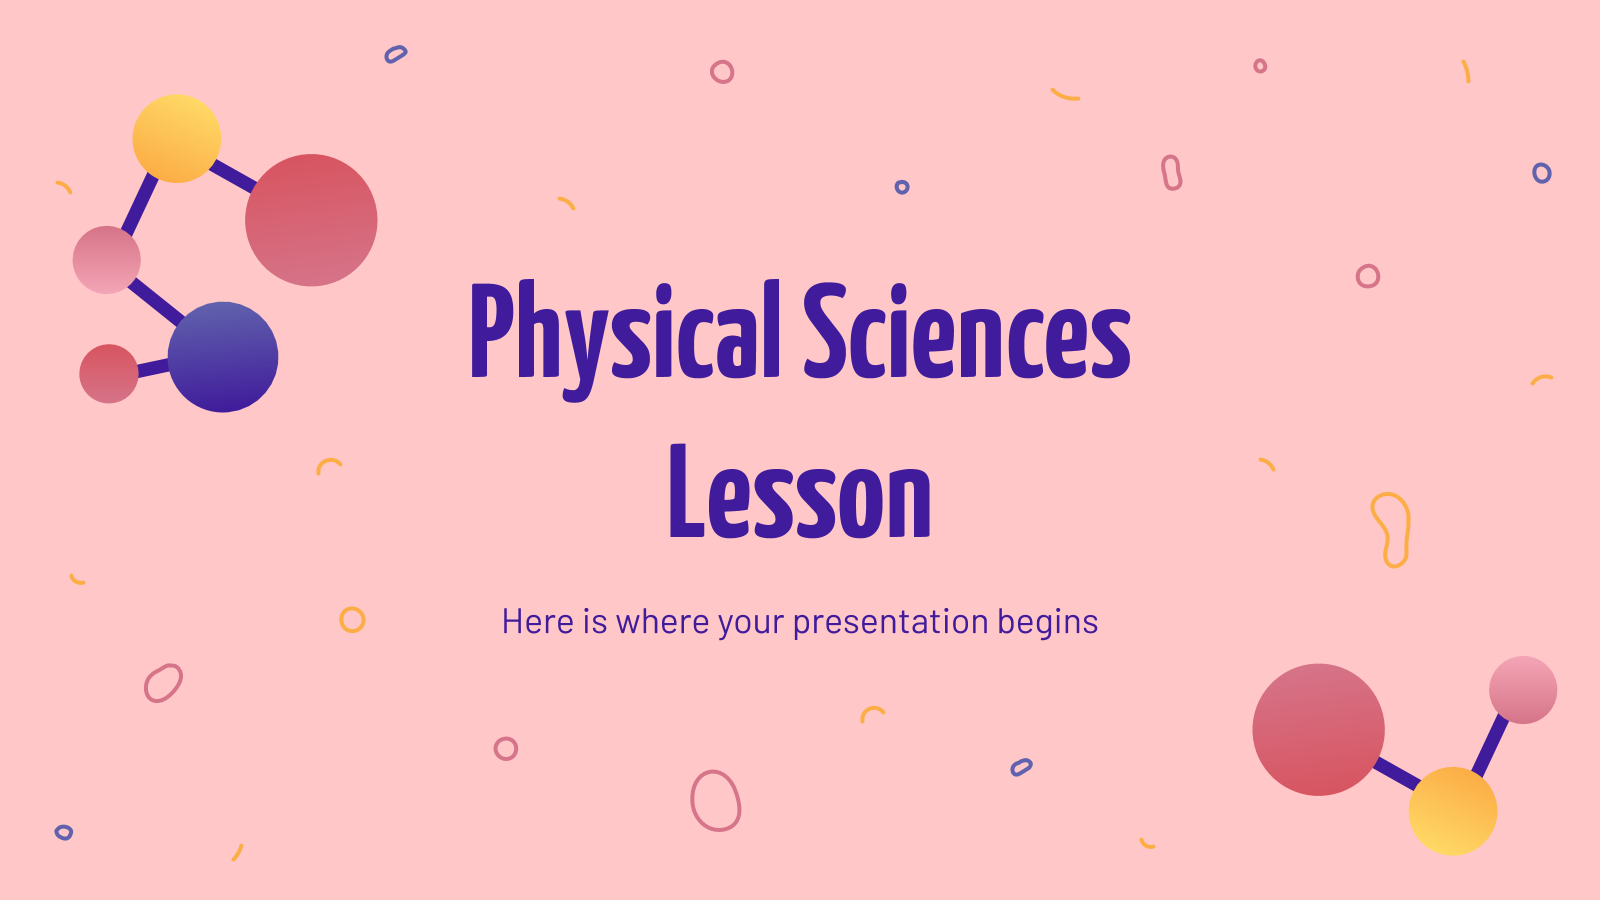 Plantilla de presentación Lección de física